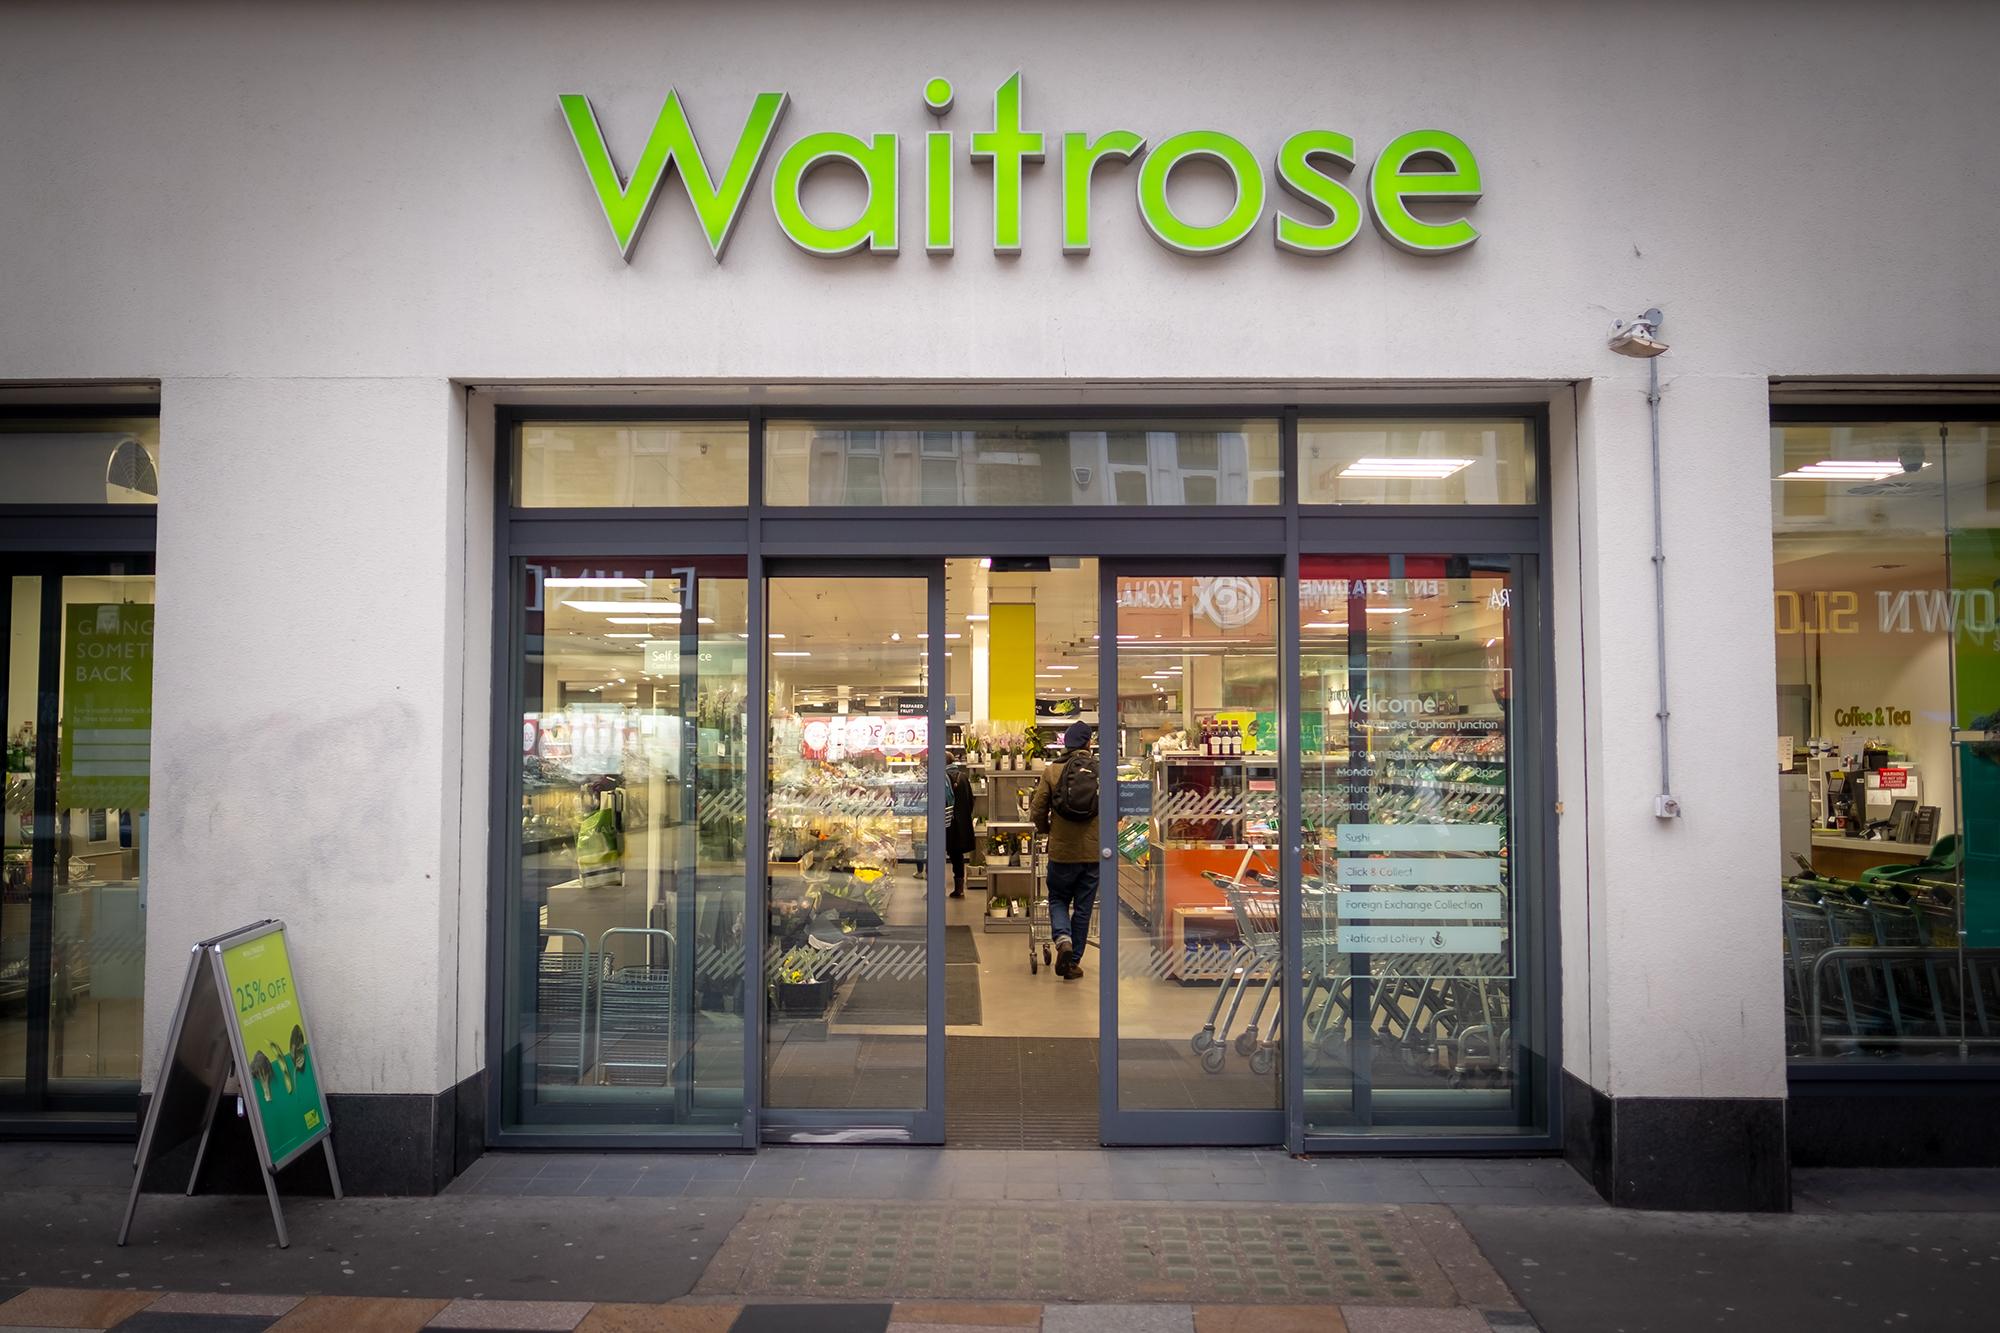 Waitrose supermarket. (Image: Willy Barton/Shutterstock)